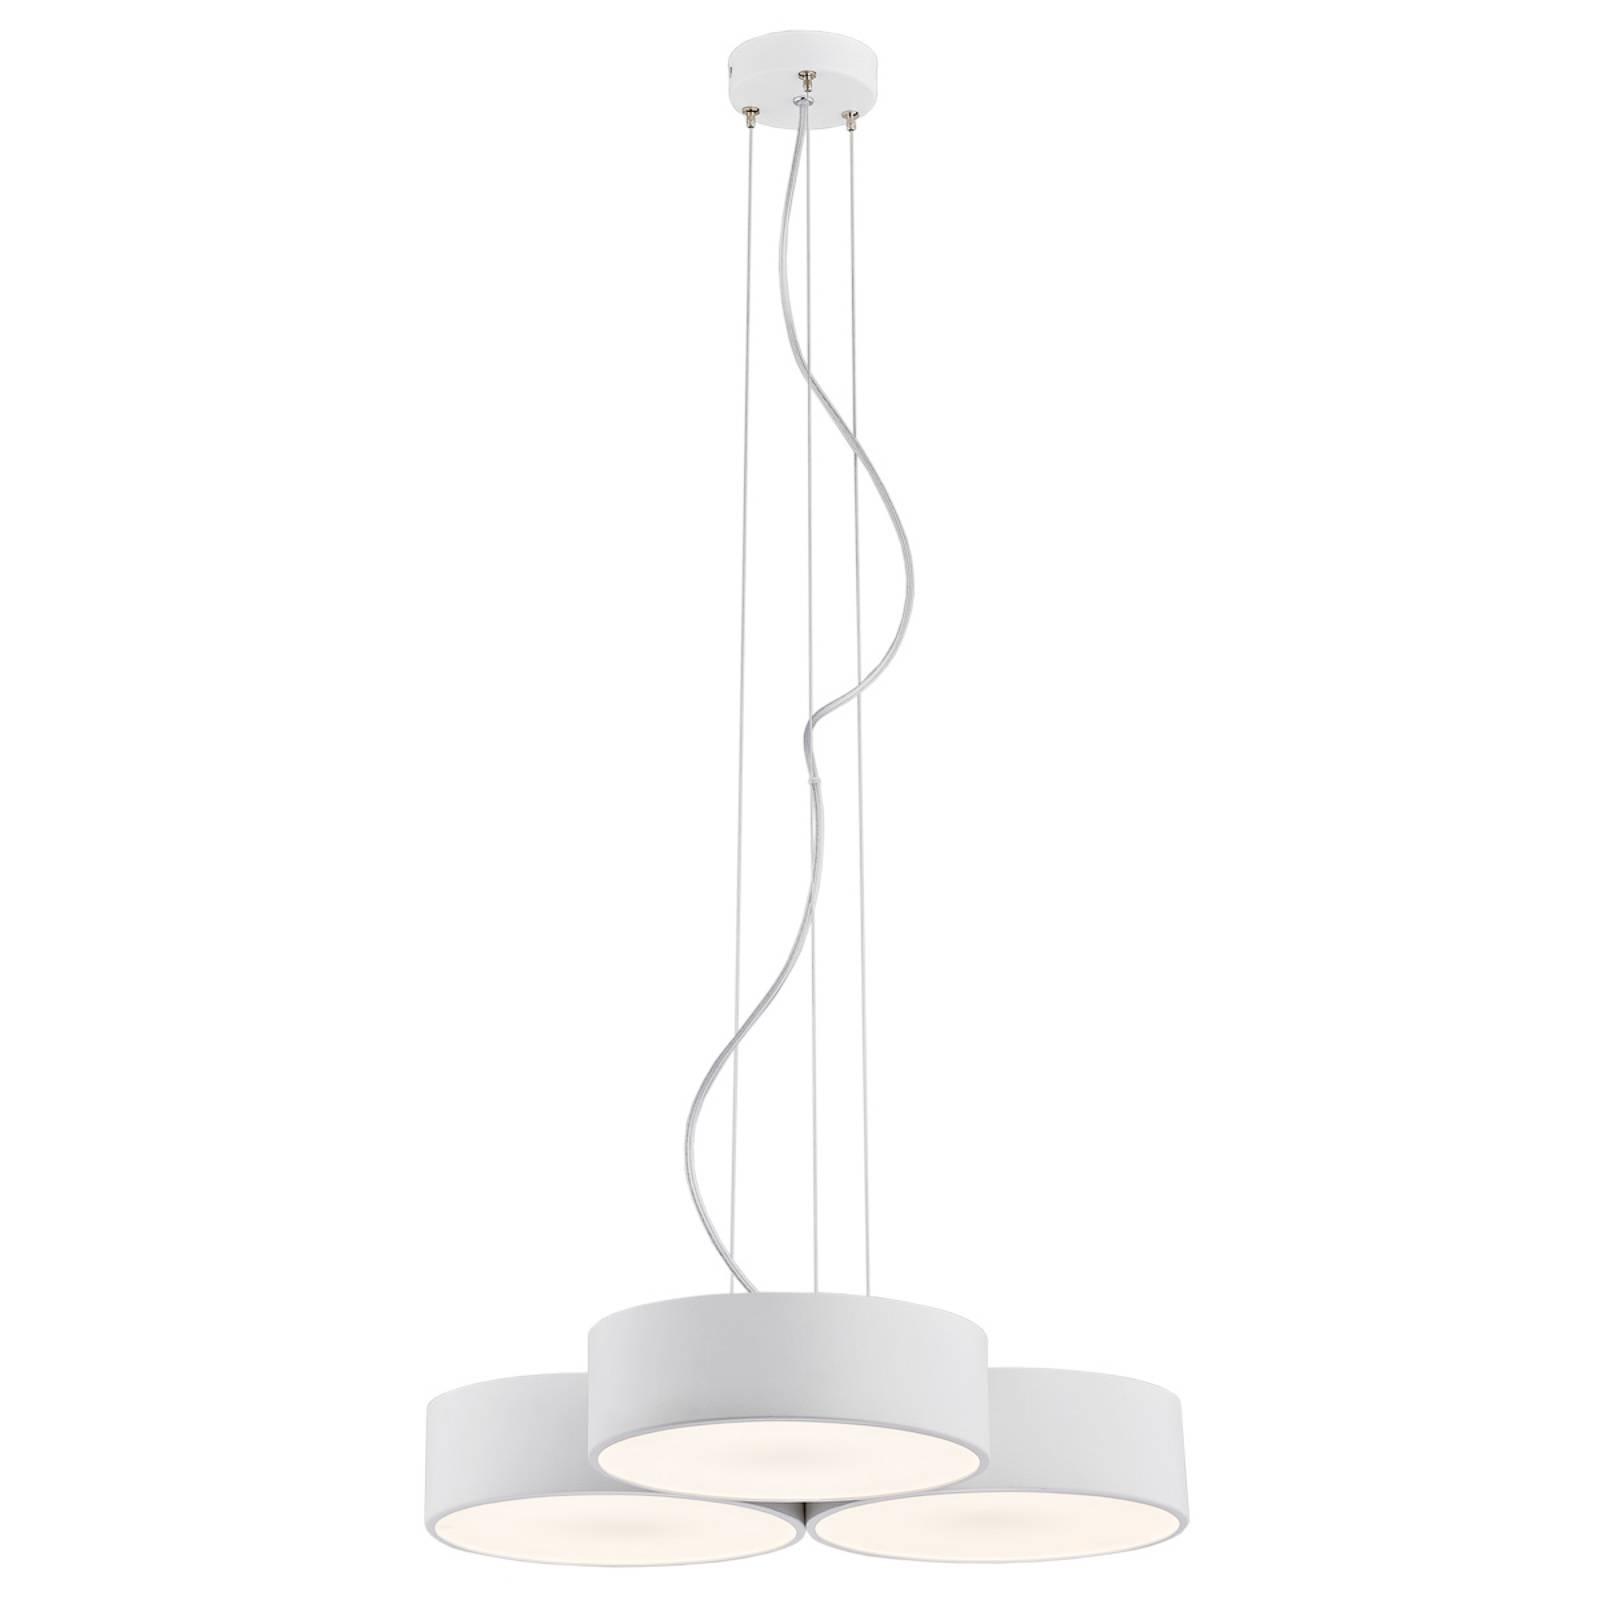 Suspension LED Dayton trois lampes, blanche